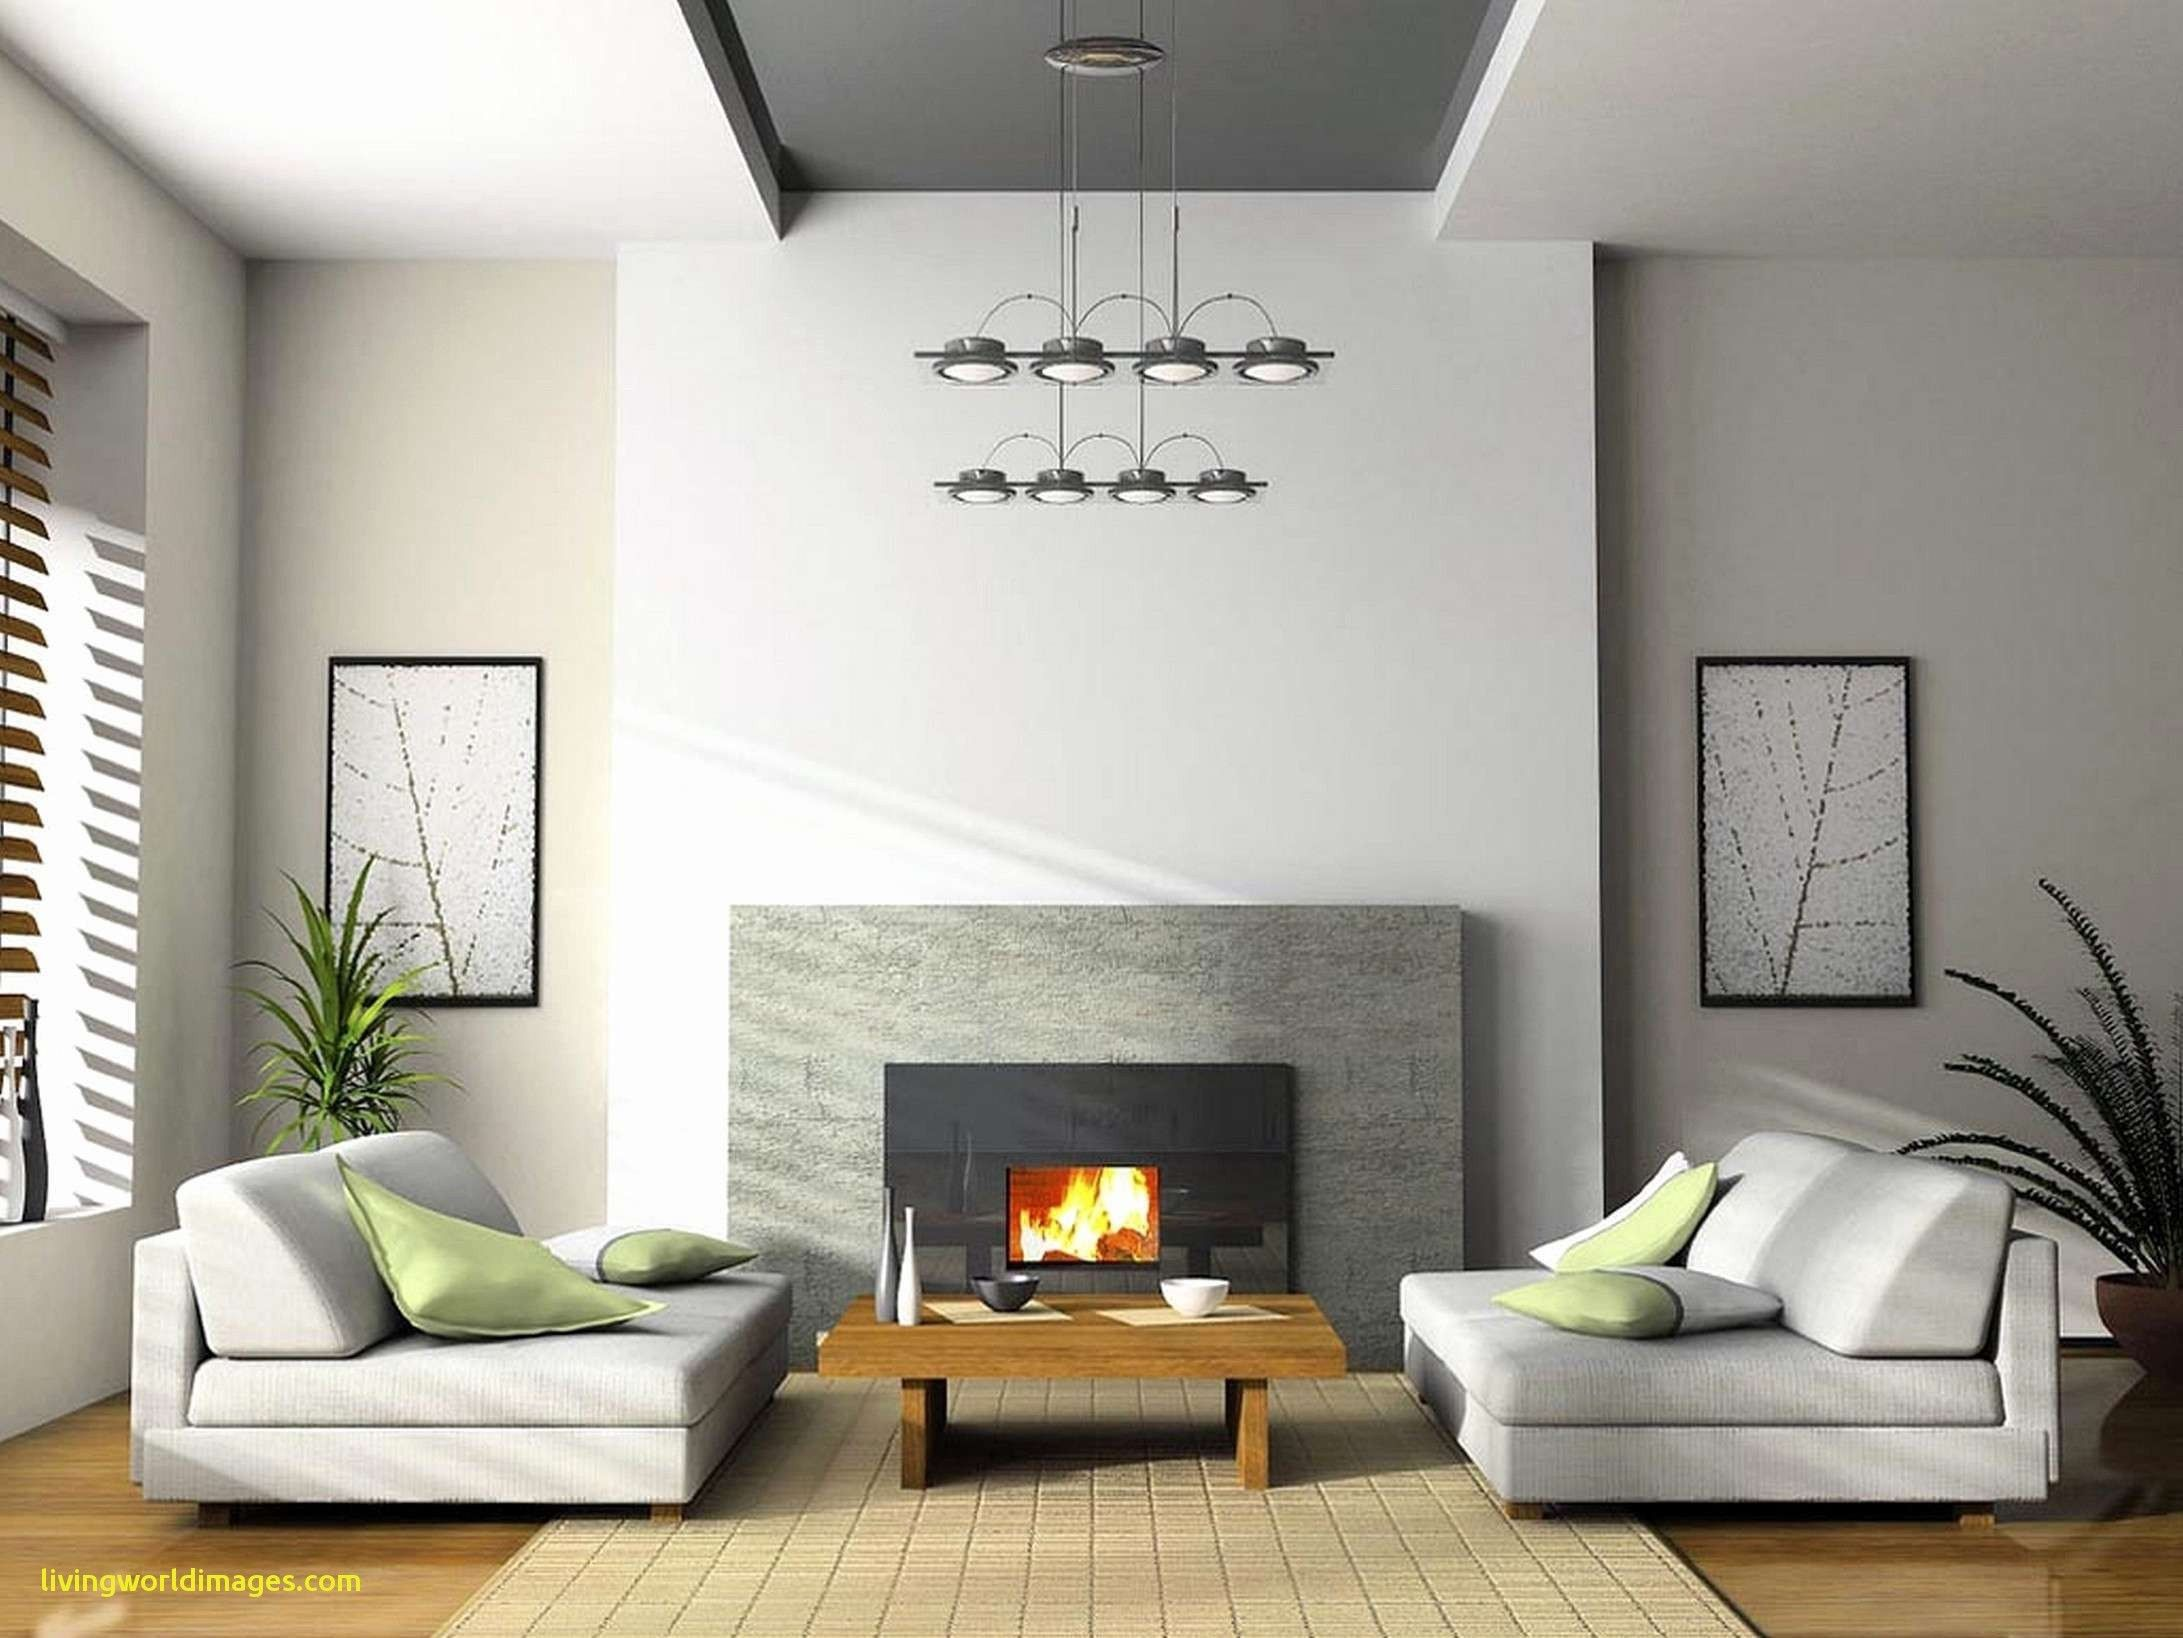 New latest interior design for living room also ultimate home decor rh pinterest